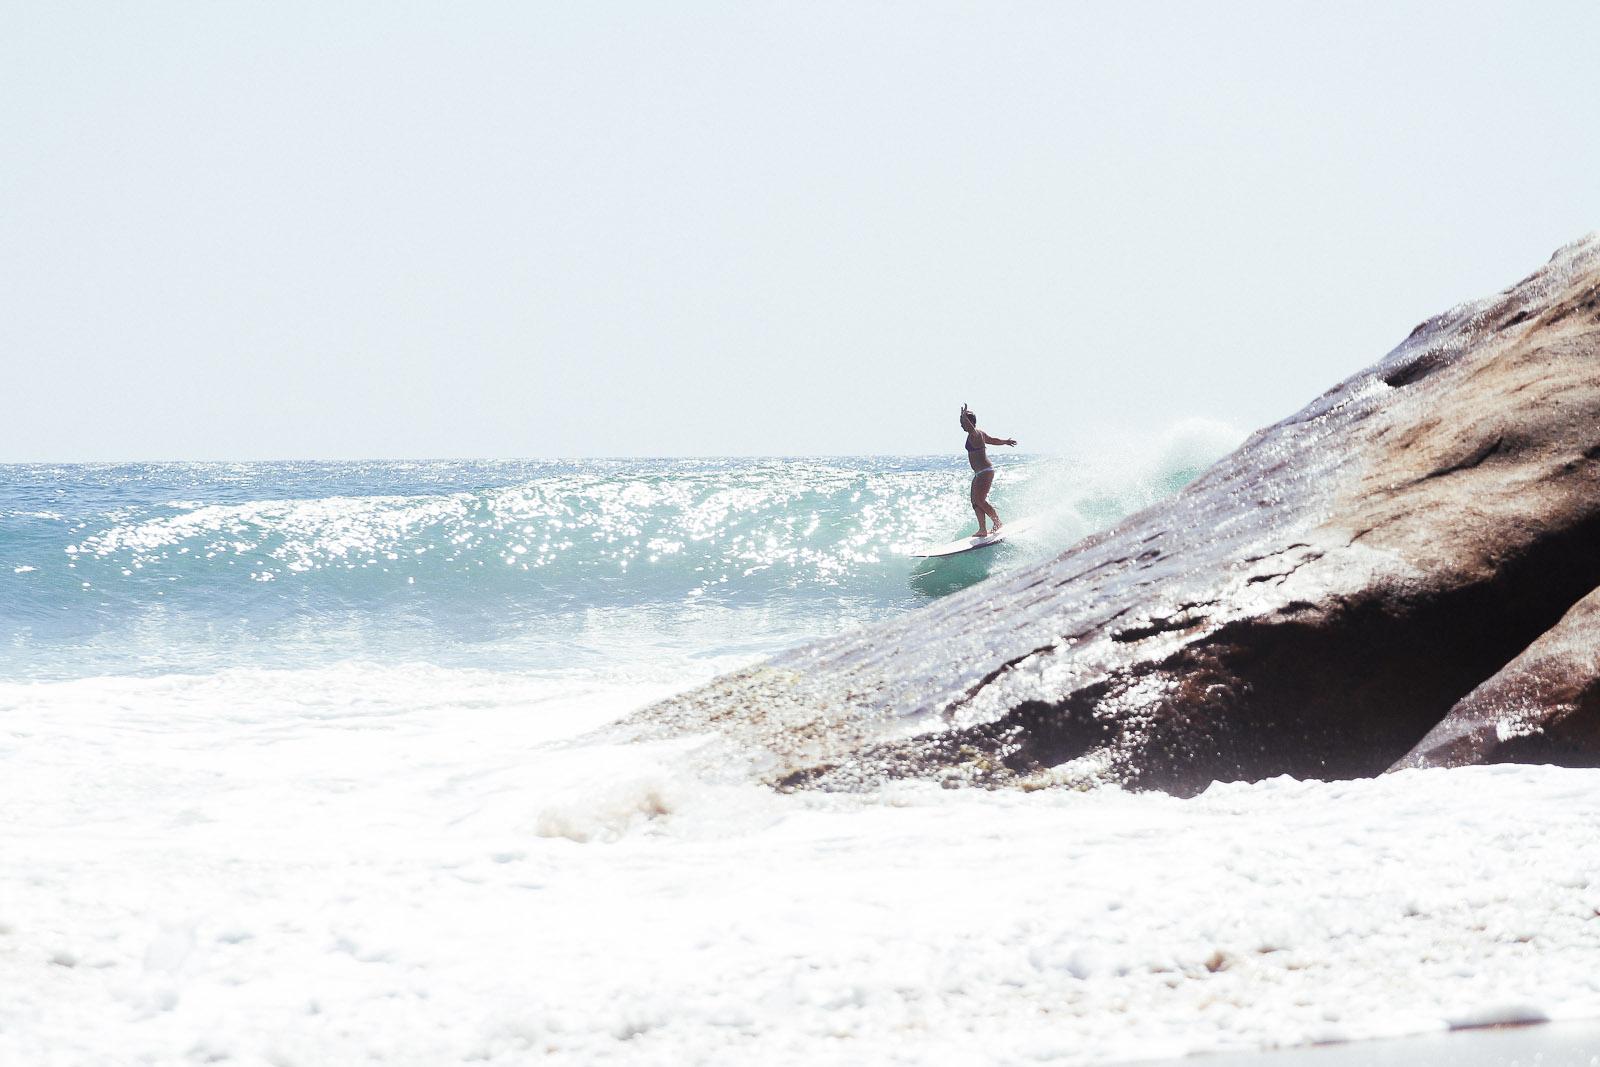 Sunshinestories-surf-travel-blog-IMG_7891-5